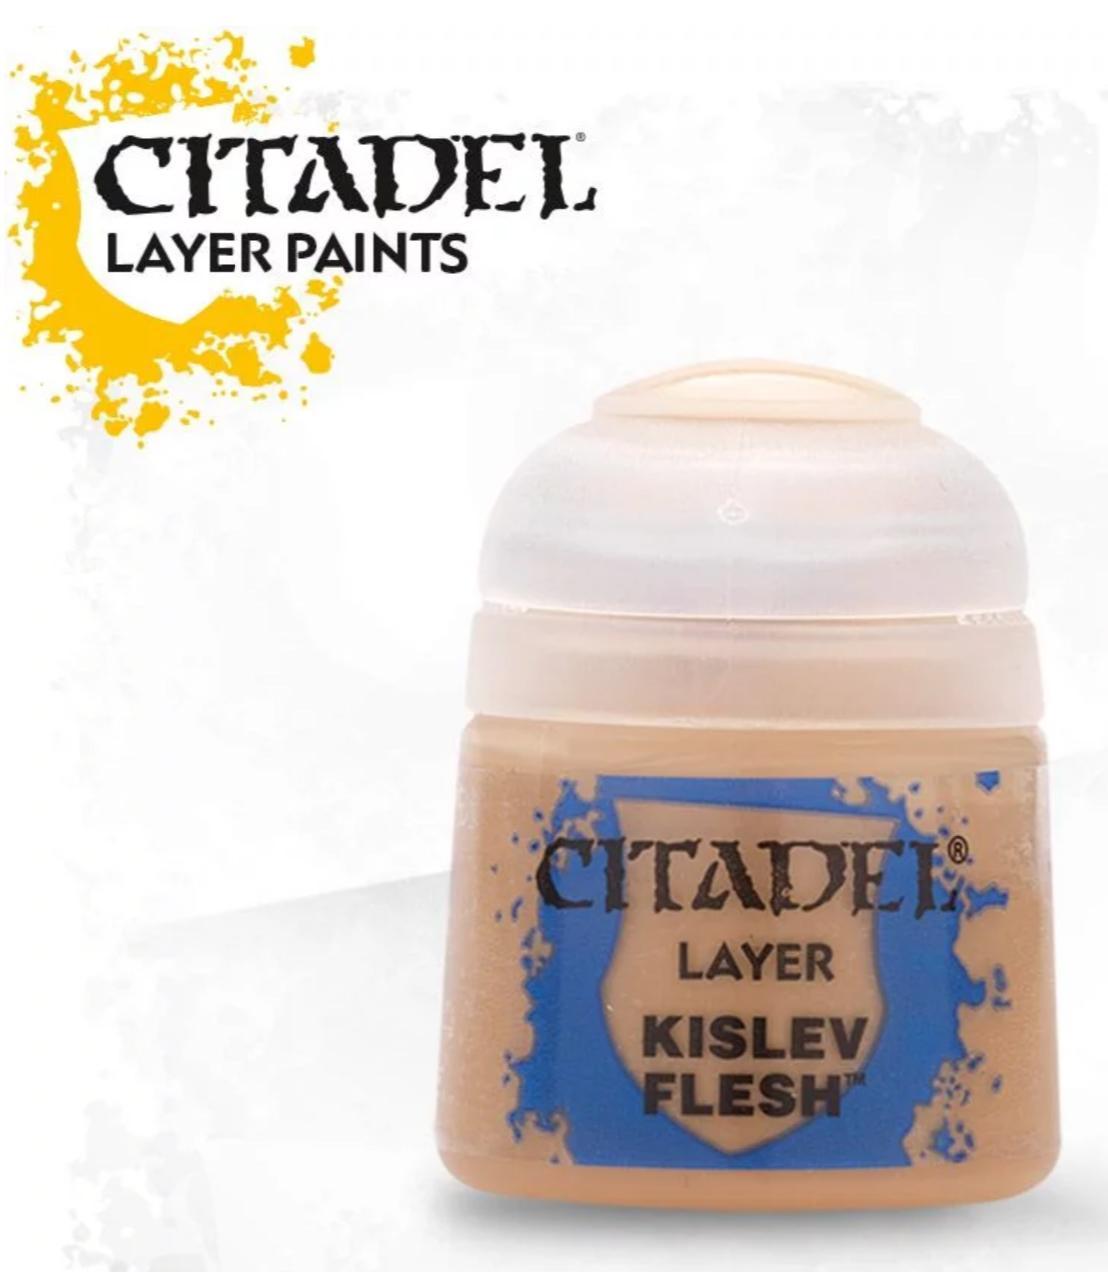 CITADEL BASE LAYER KISLEV FLESH 12 ML